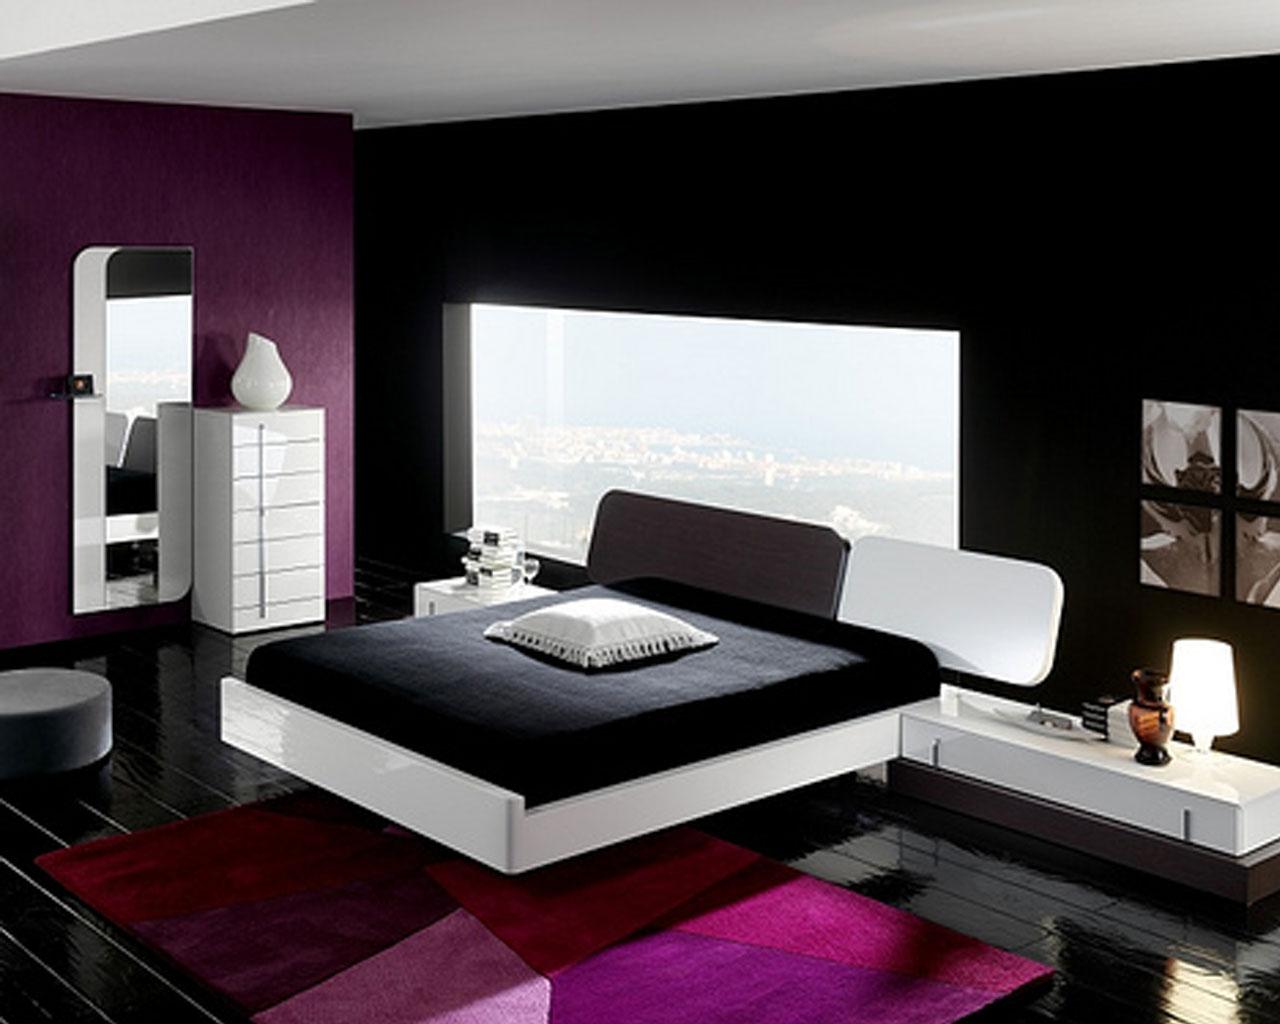 Pink And Black Interior Ideas 27 Hd Wallpaper